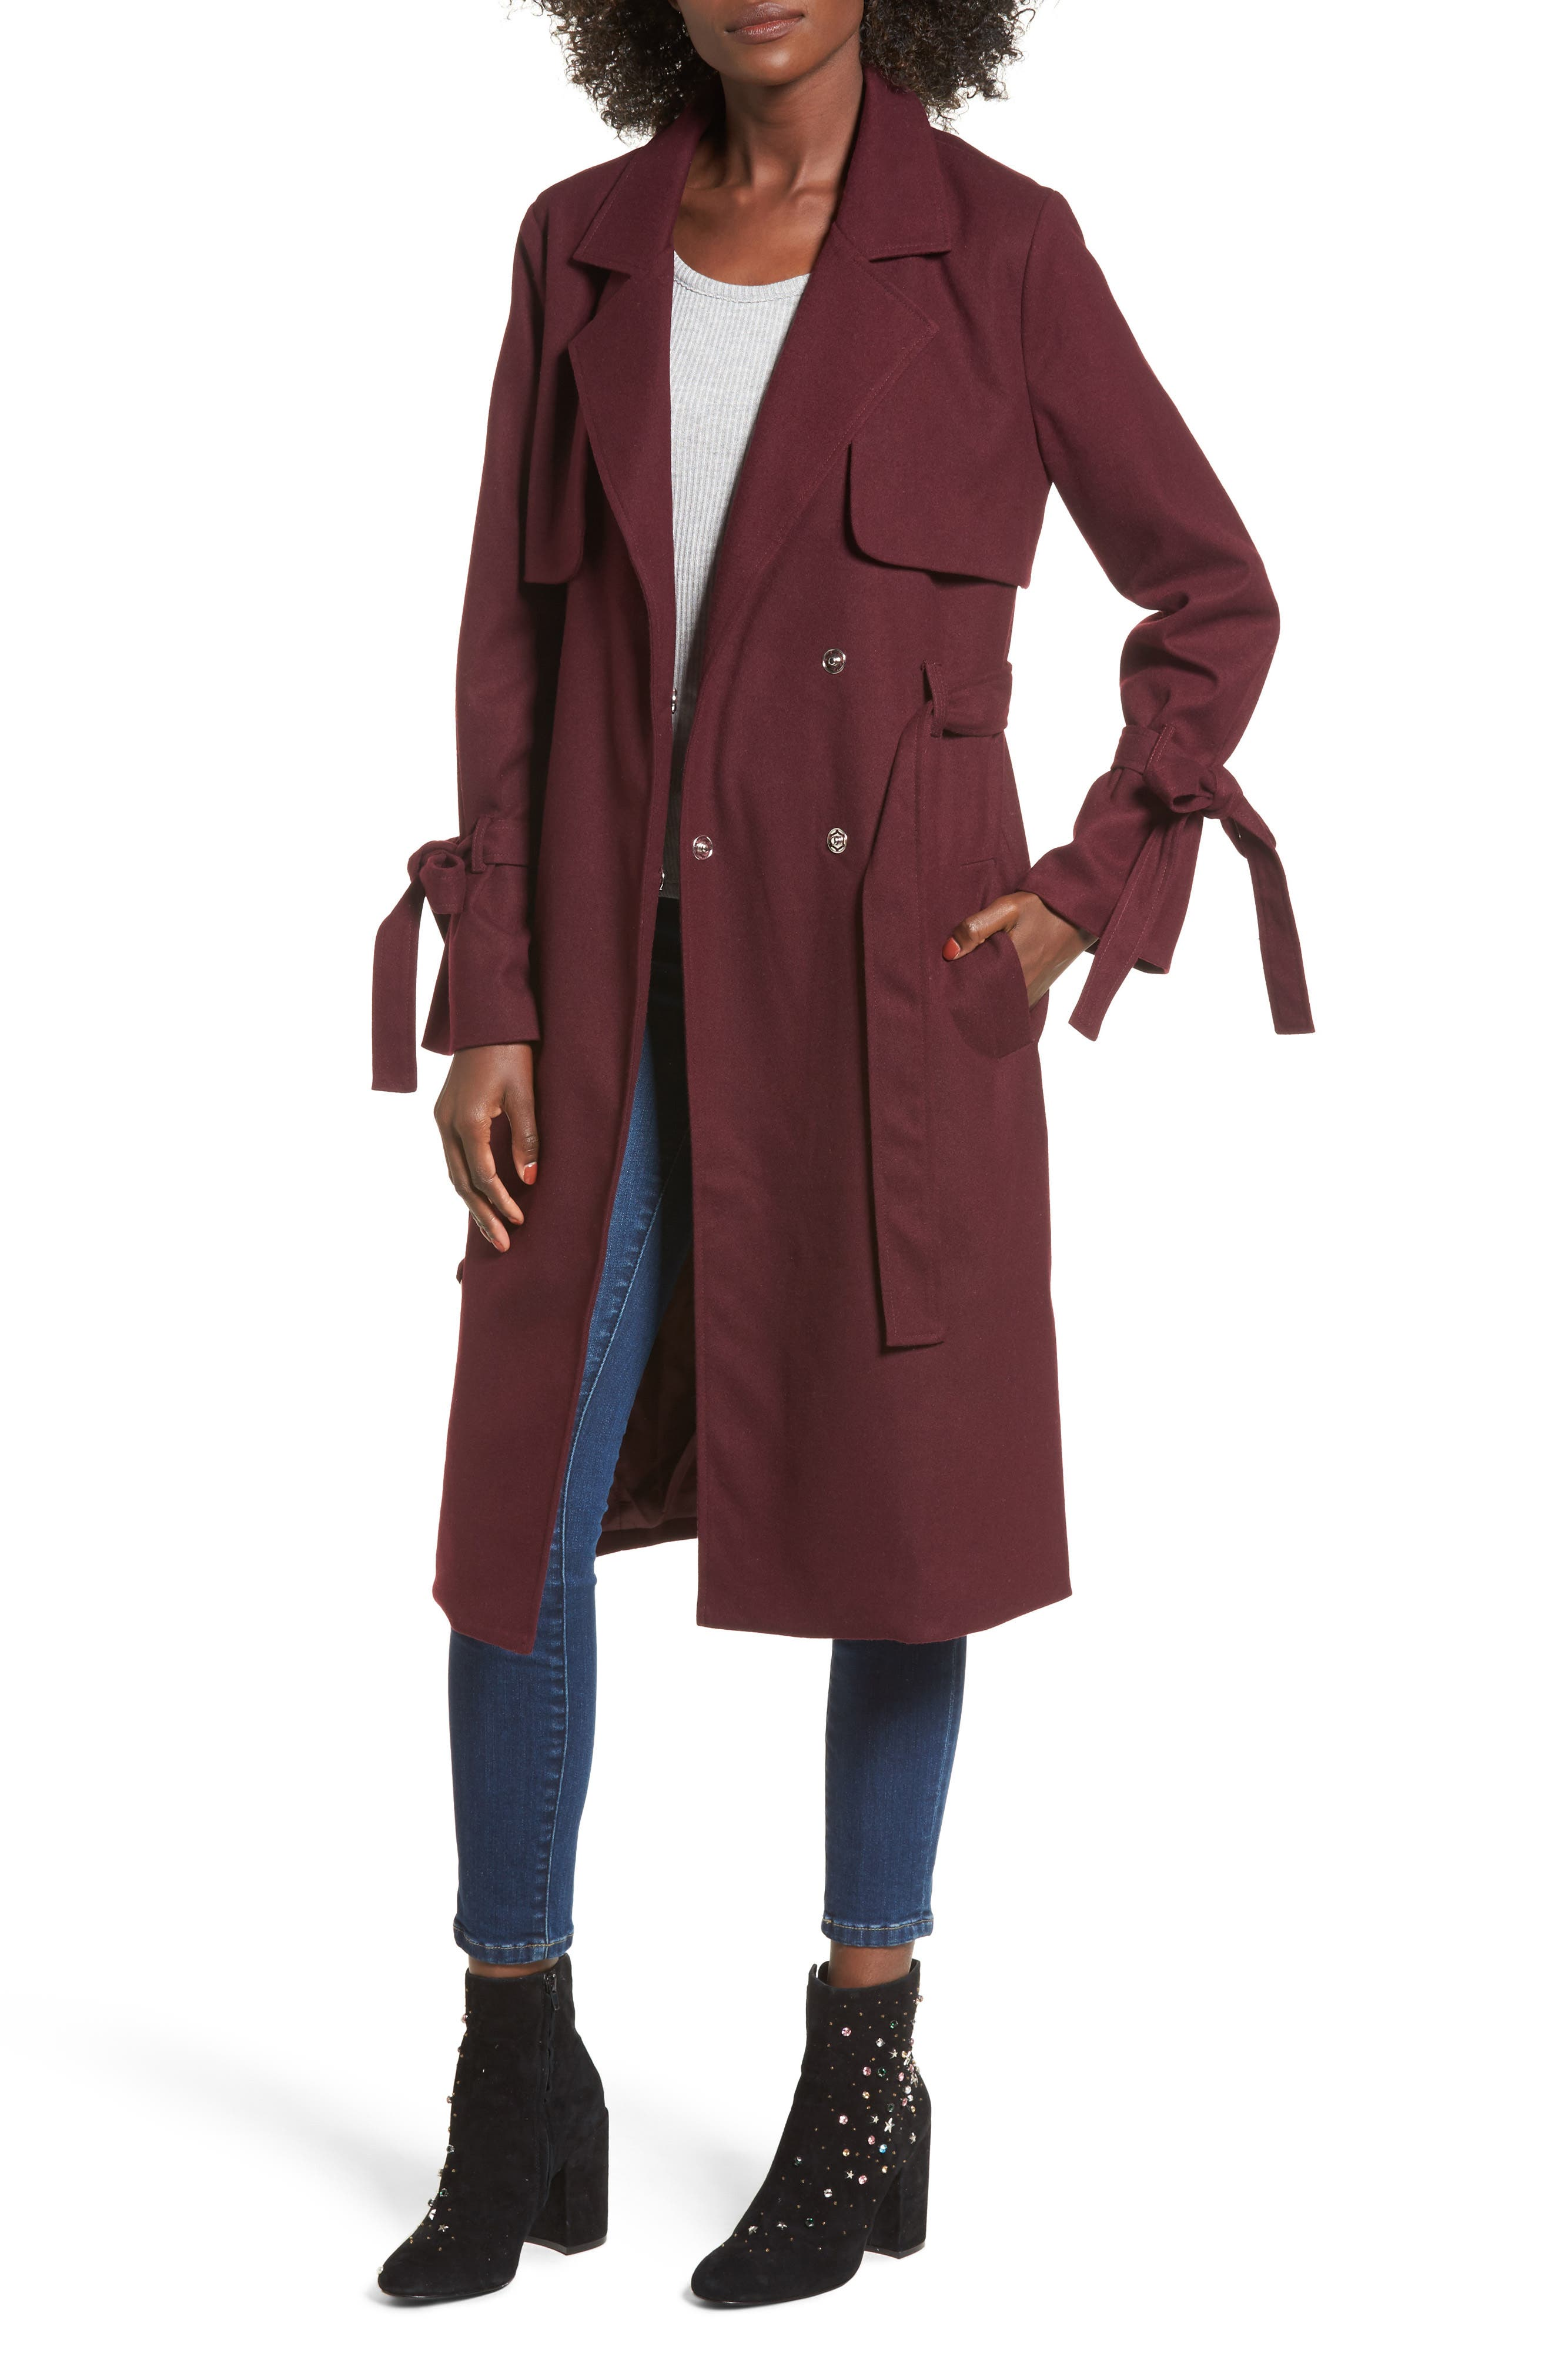 J.O.A. Tie Sleeve Trench Coat